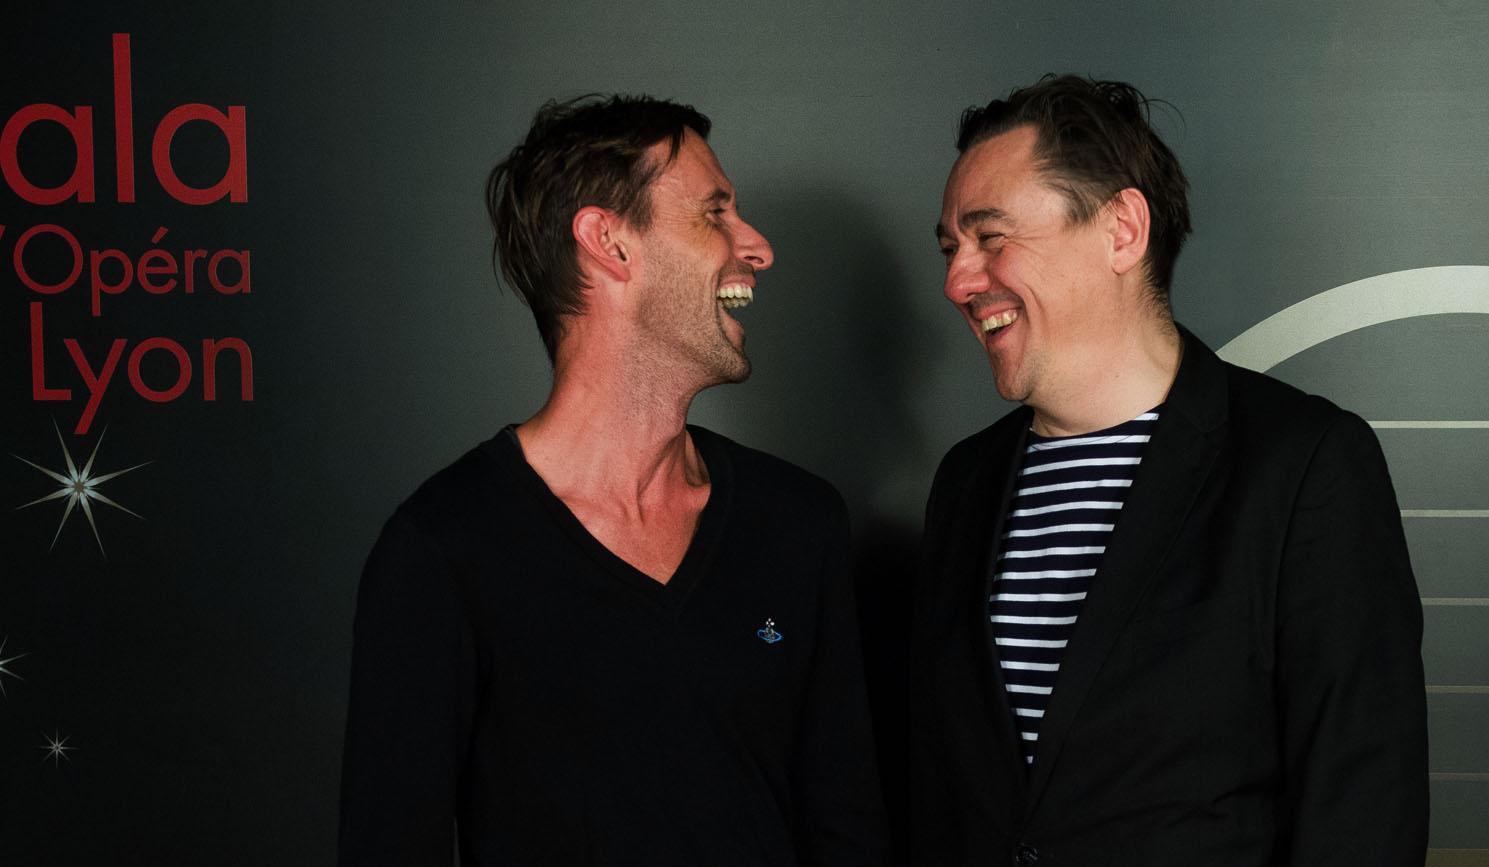 James Bonas & Gregoire Pont